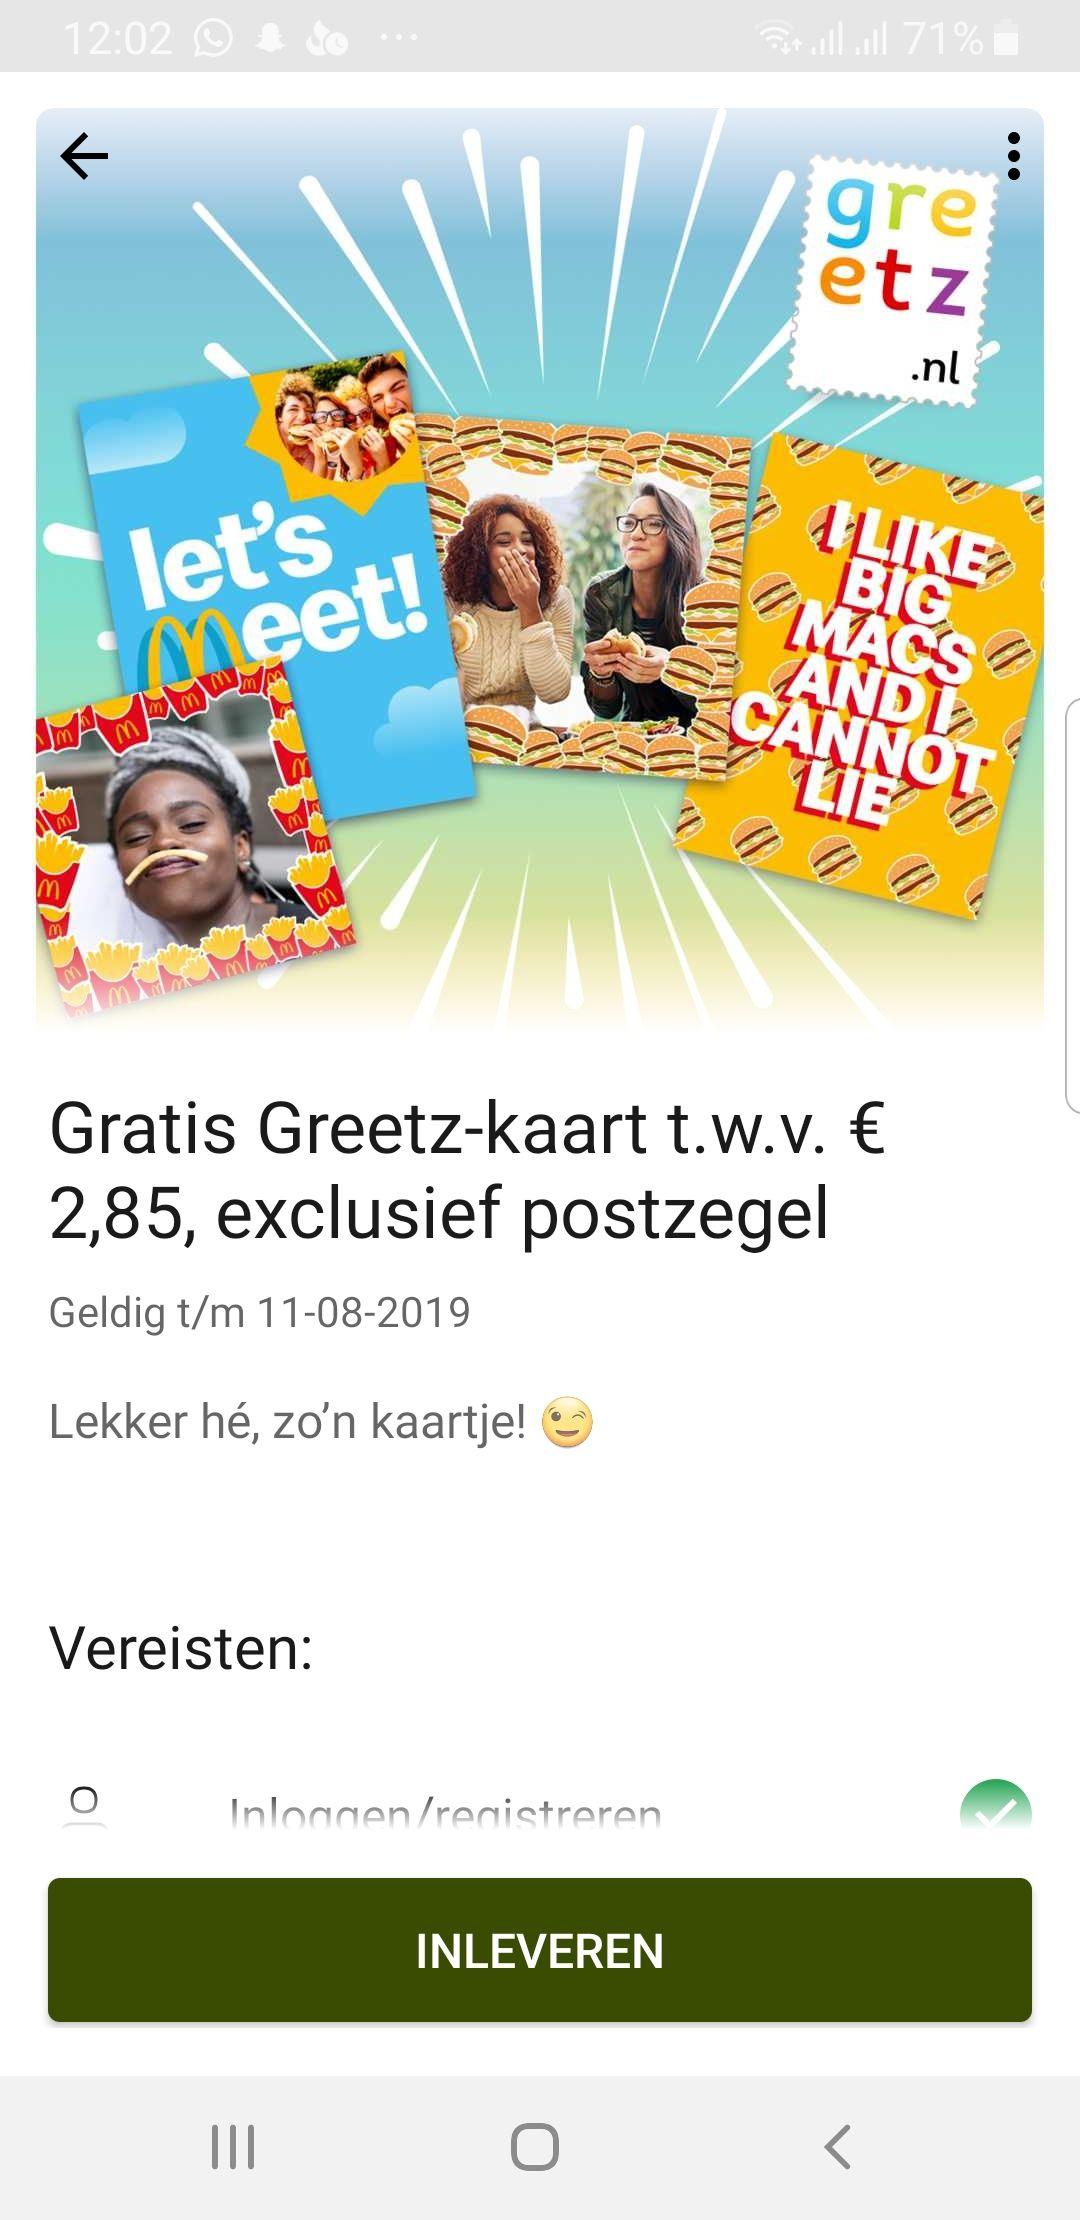 Gratis Mc donald's kaart via Greetz t.w.v. €2,85